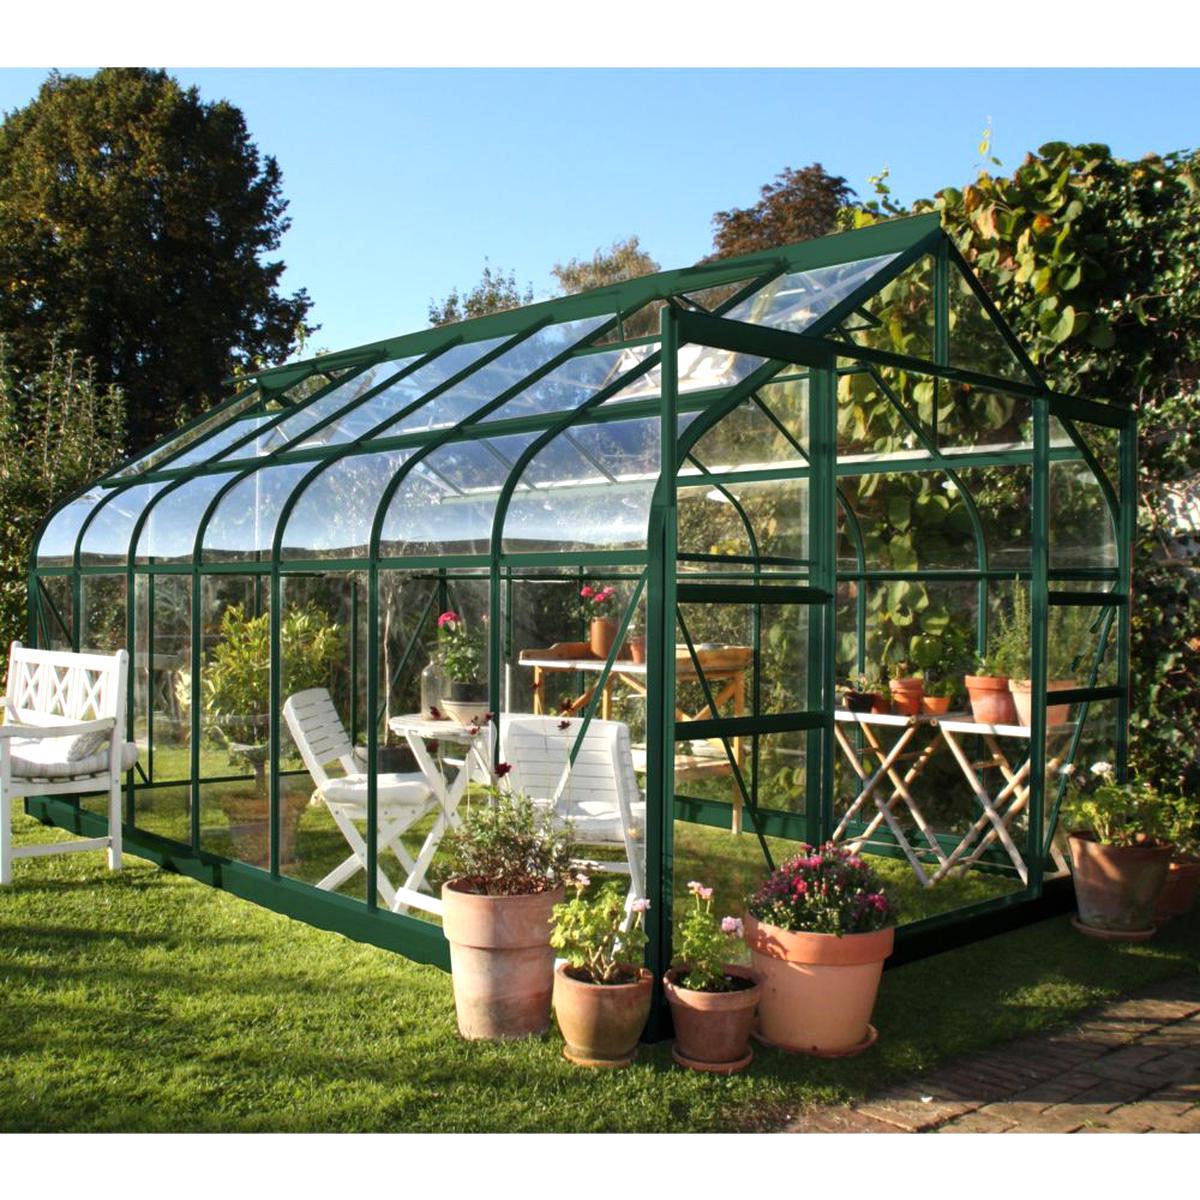 Serre Jardin D'occasion   Plus Que 2 À -65% serapportantà Bon Coin Serre Jardin Occasion